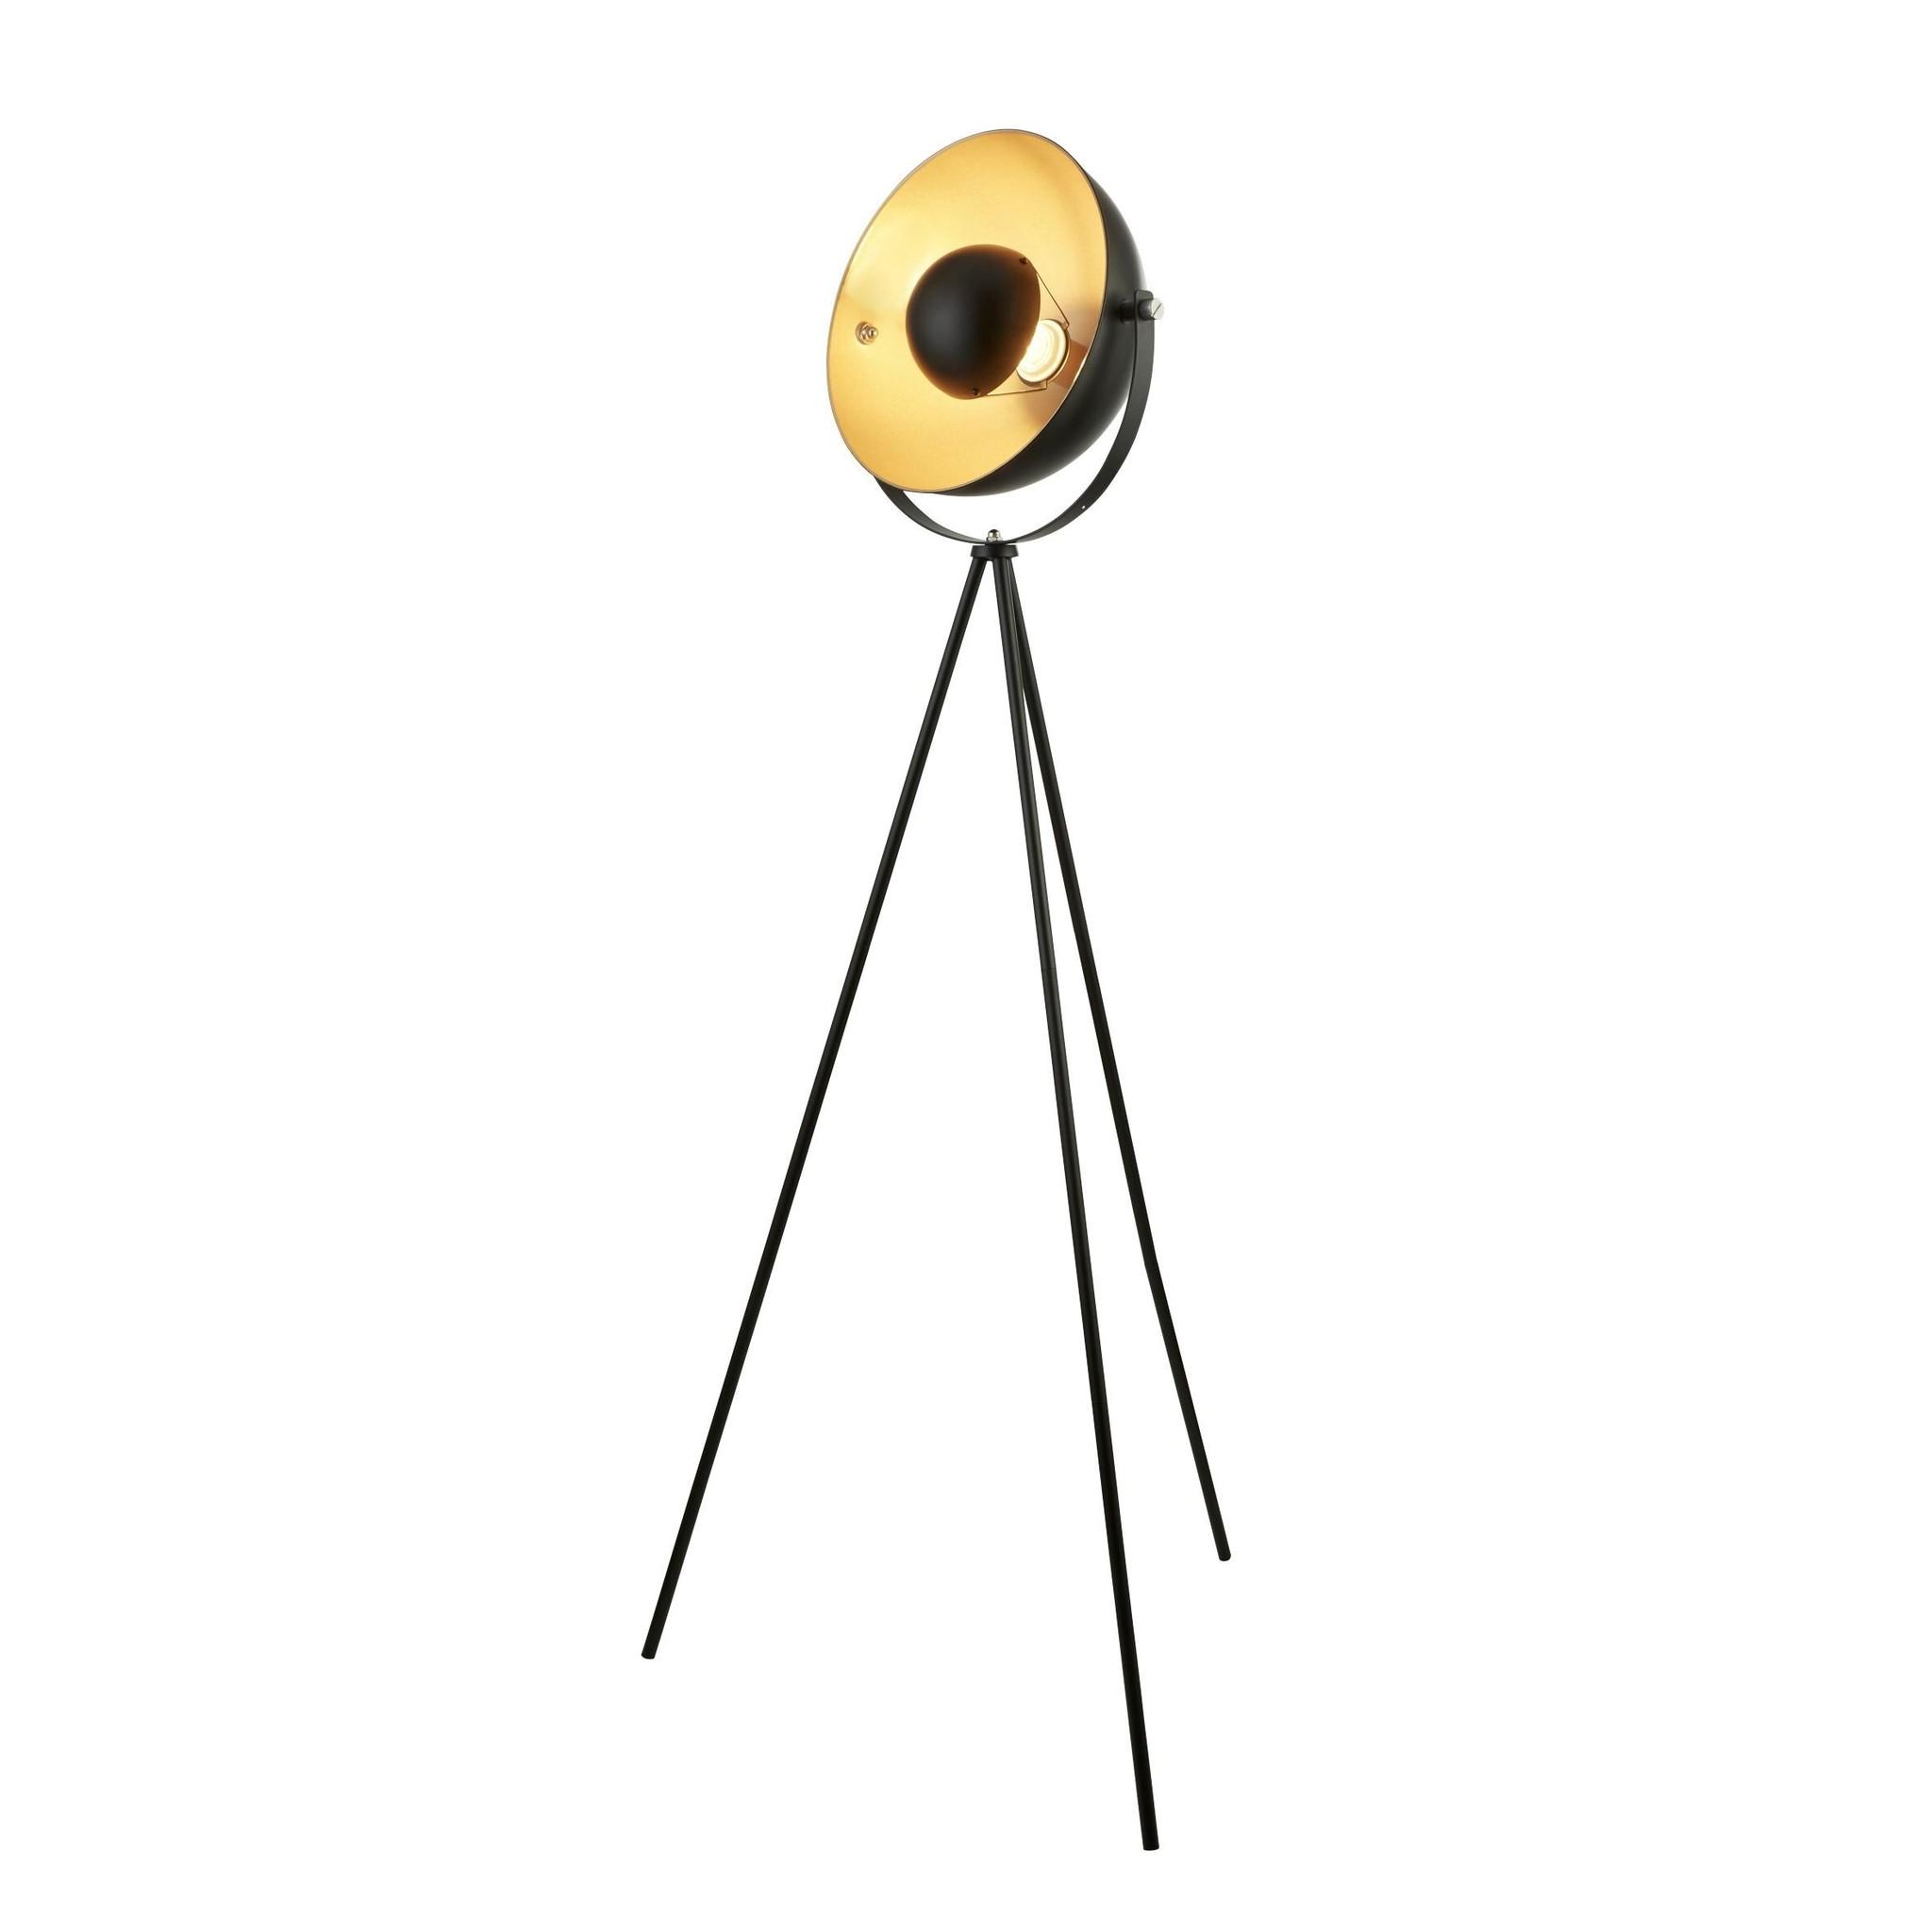 Loft Modern Tripod Floor Lamp Black Gold Lightbox